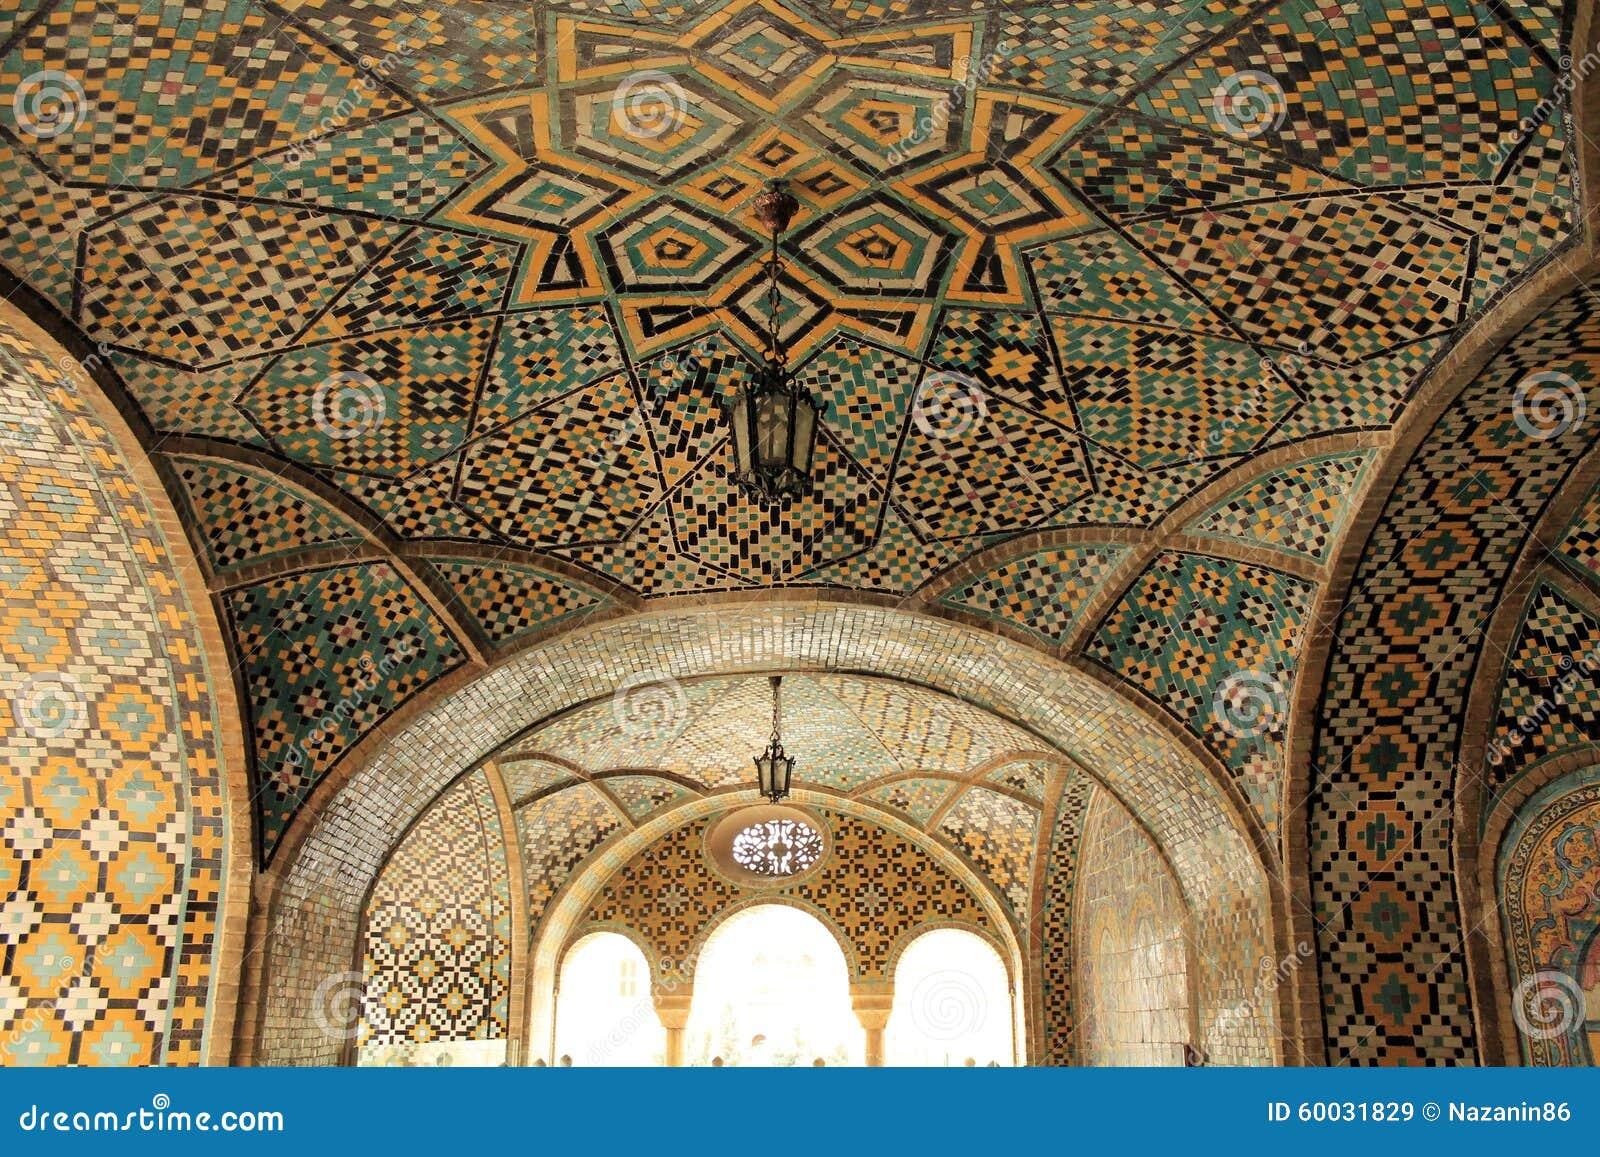 Ceiling Art In Golestan Palace Tehran Iran Stock Image